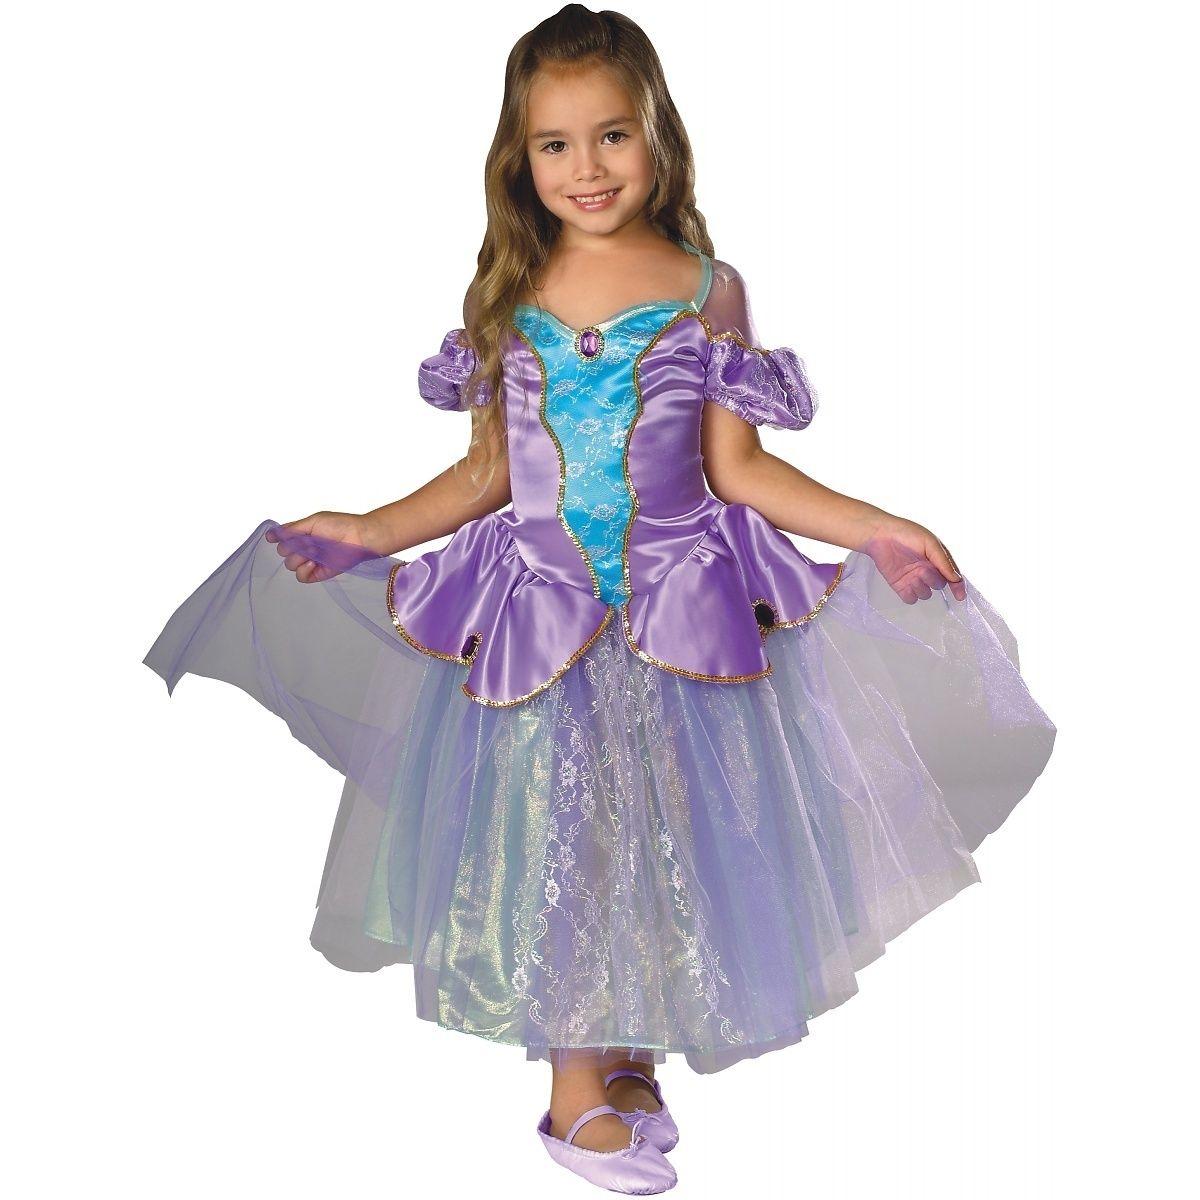 Ballerina Diva Costume Kids Girls Fairy Tale Princess Halloween Fancy Dress | eBay  sc 1 st  Pinterest & Ballerina Diva Costume Kids Girls Fairy Tale Princess Halloween ...